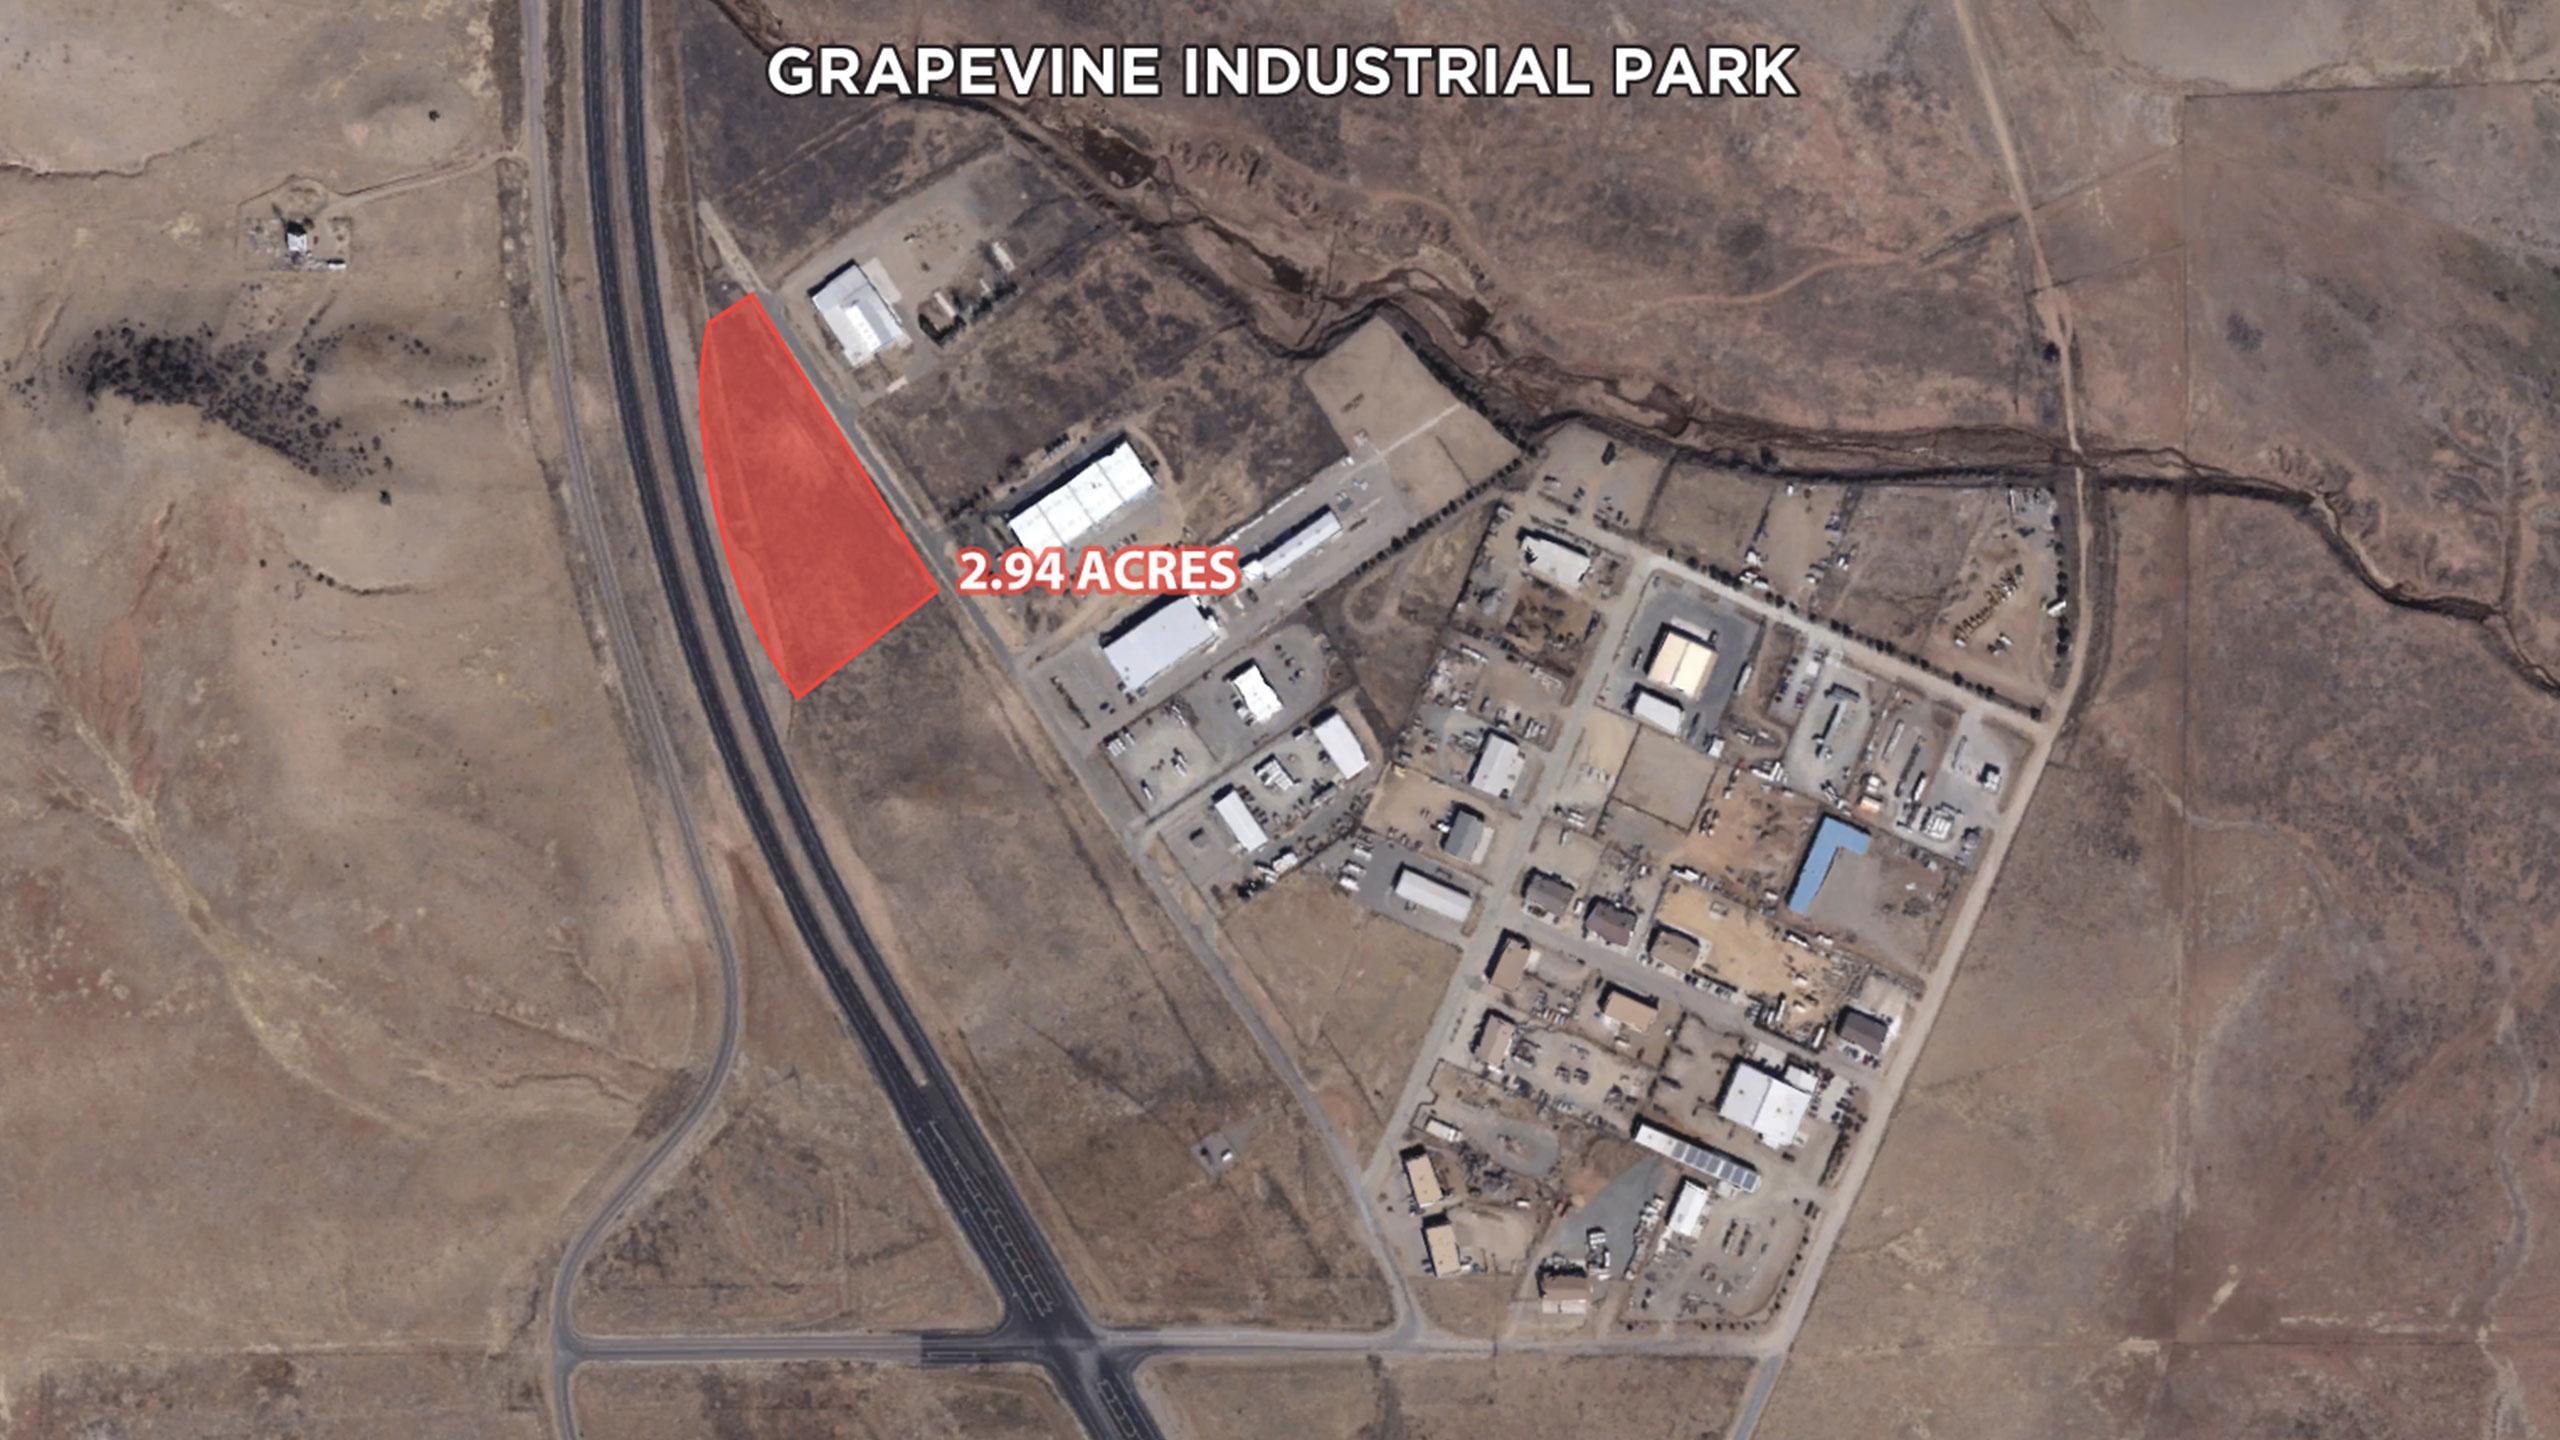 Grapevine-Industrial-Park-Hero-2.94Ac